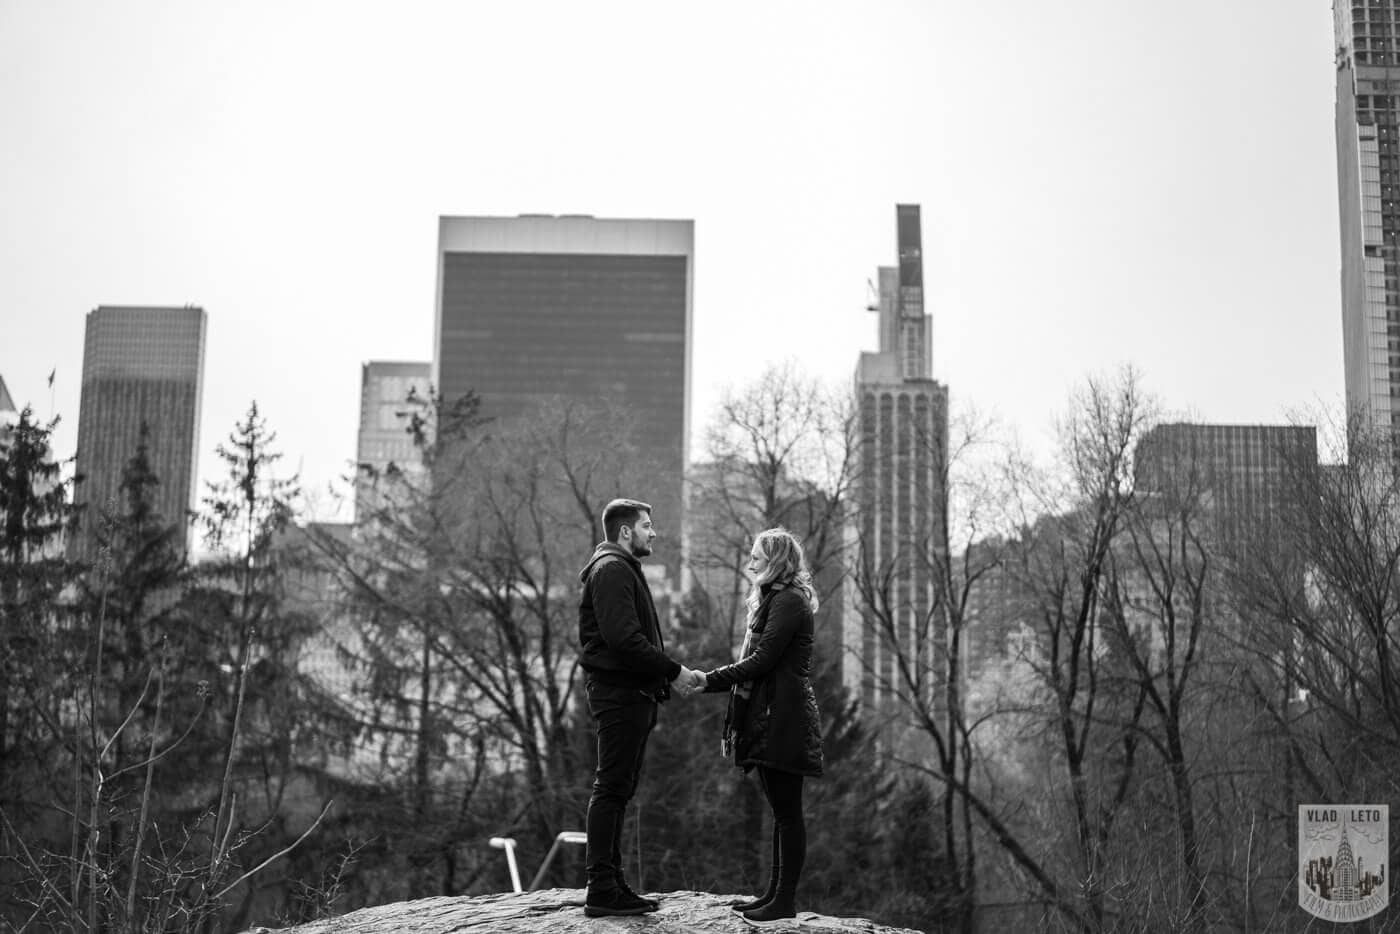 Photo 5 Bow bridge wedding proposal in Central Park   VladLeto